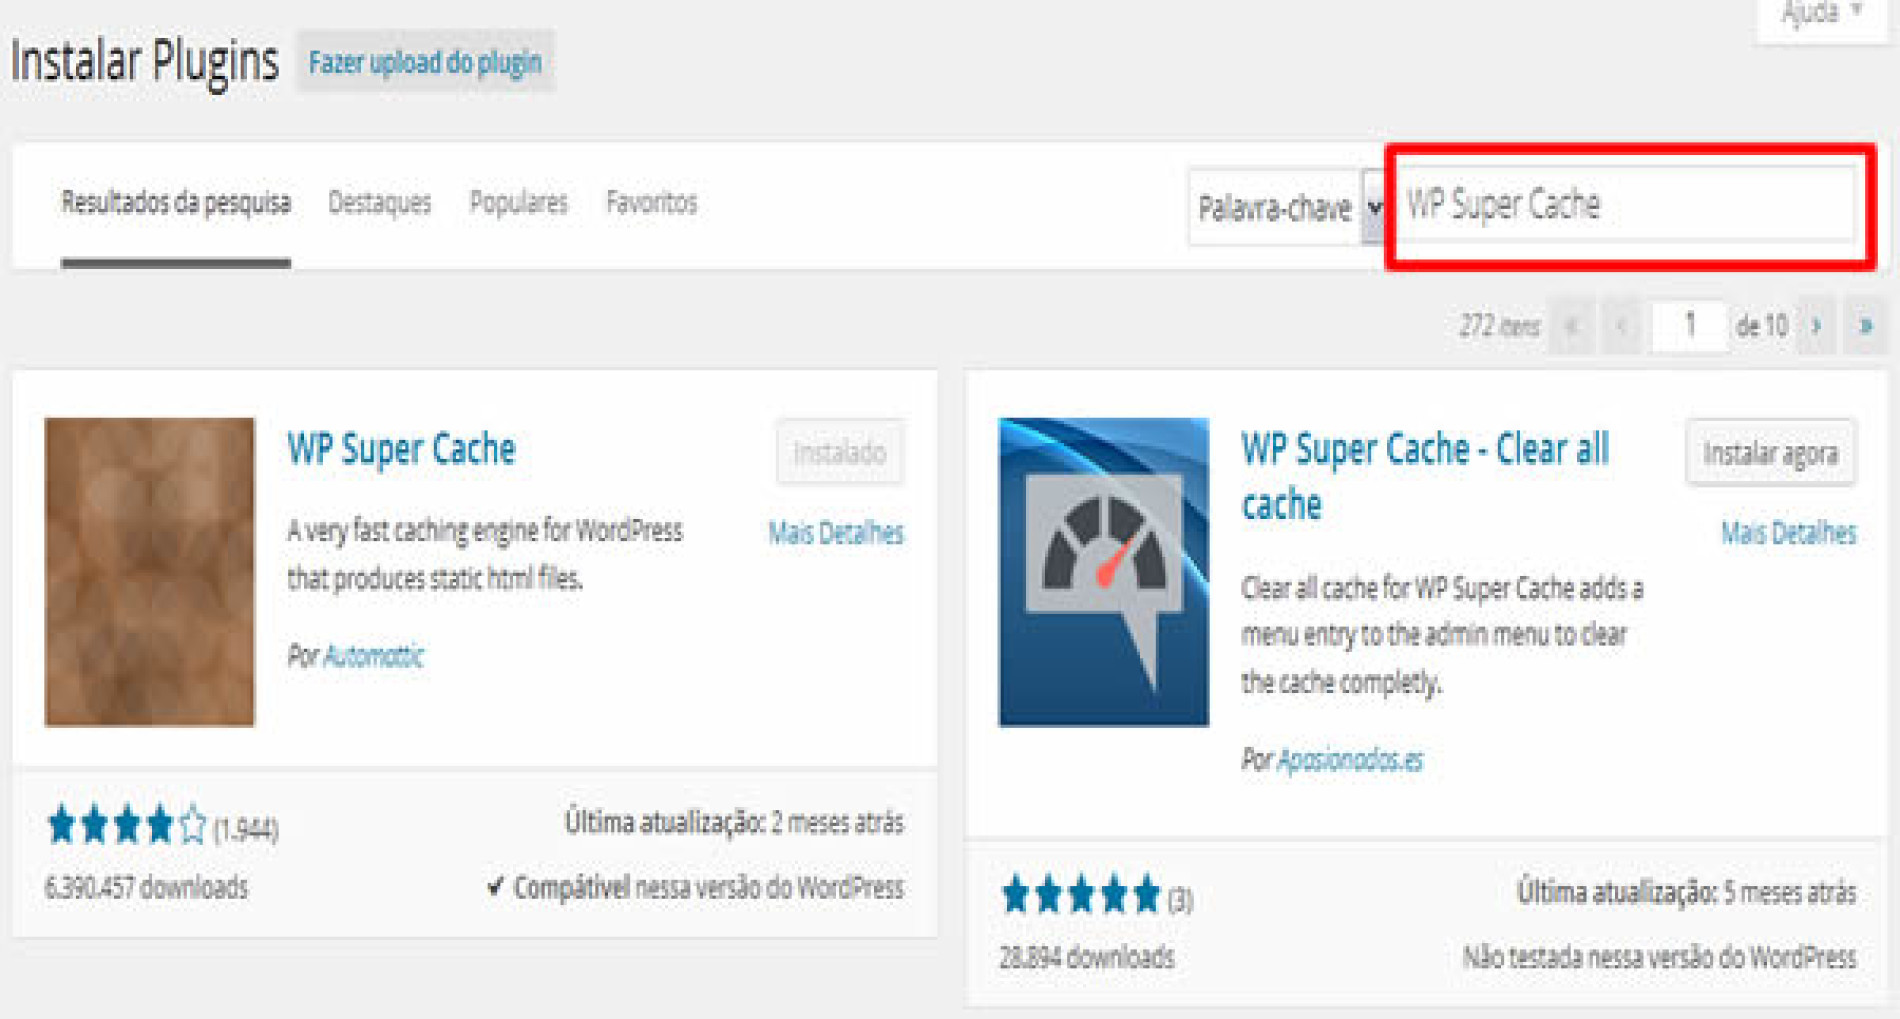 Como instalar o Plugin WP Super Cache no WordPress